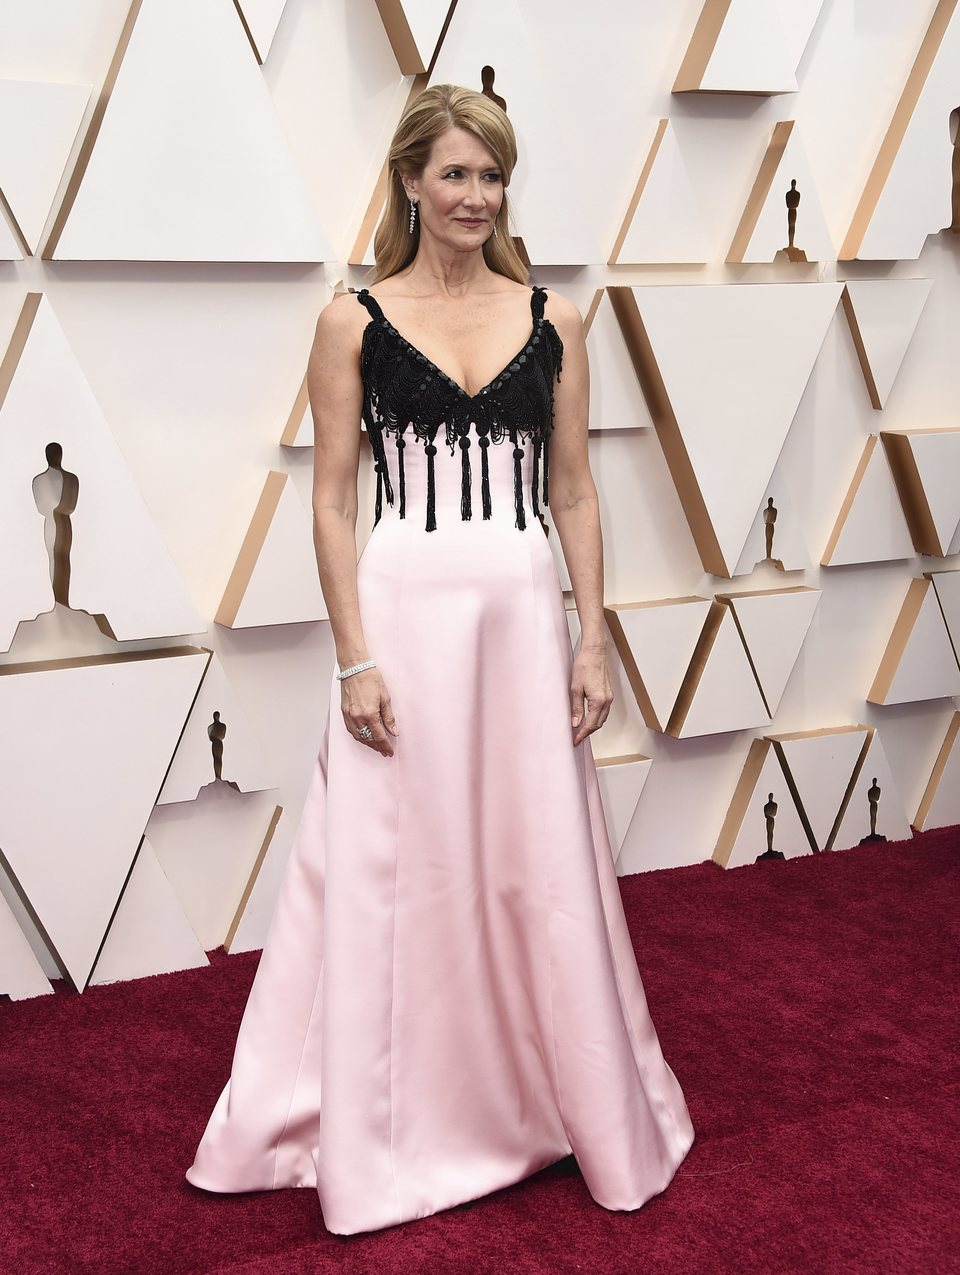 Laura Dern at the Oscar 2020 red carpet